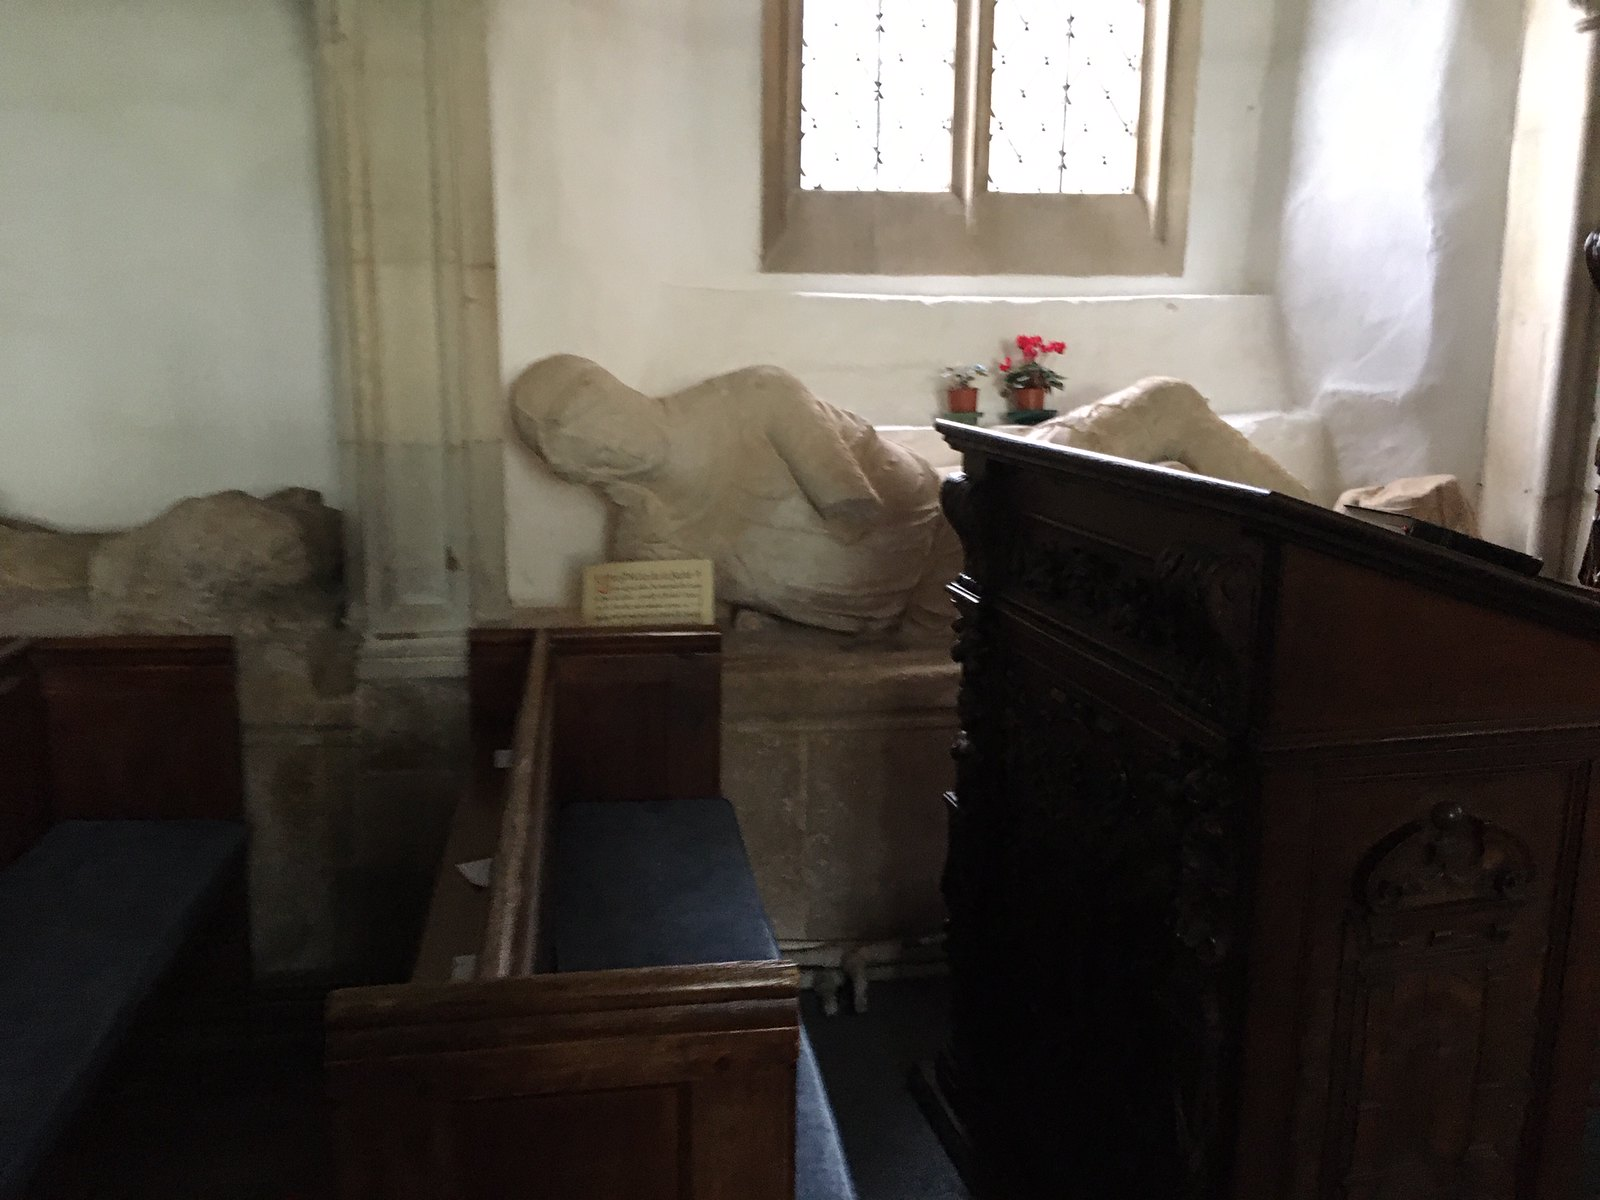 Tedious sermon? An Aldworth giant - Goring Circular